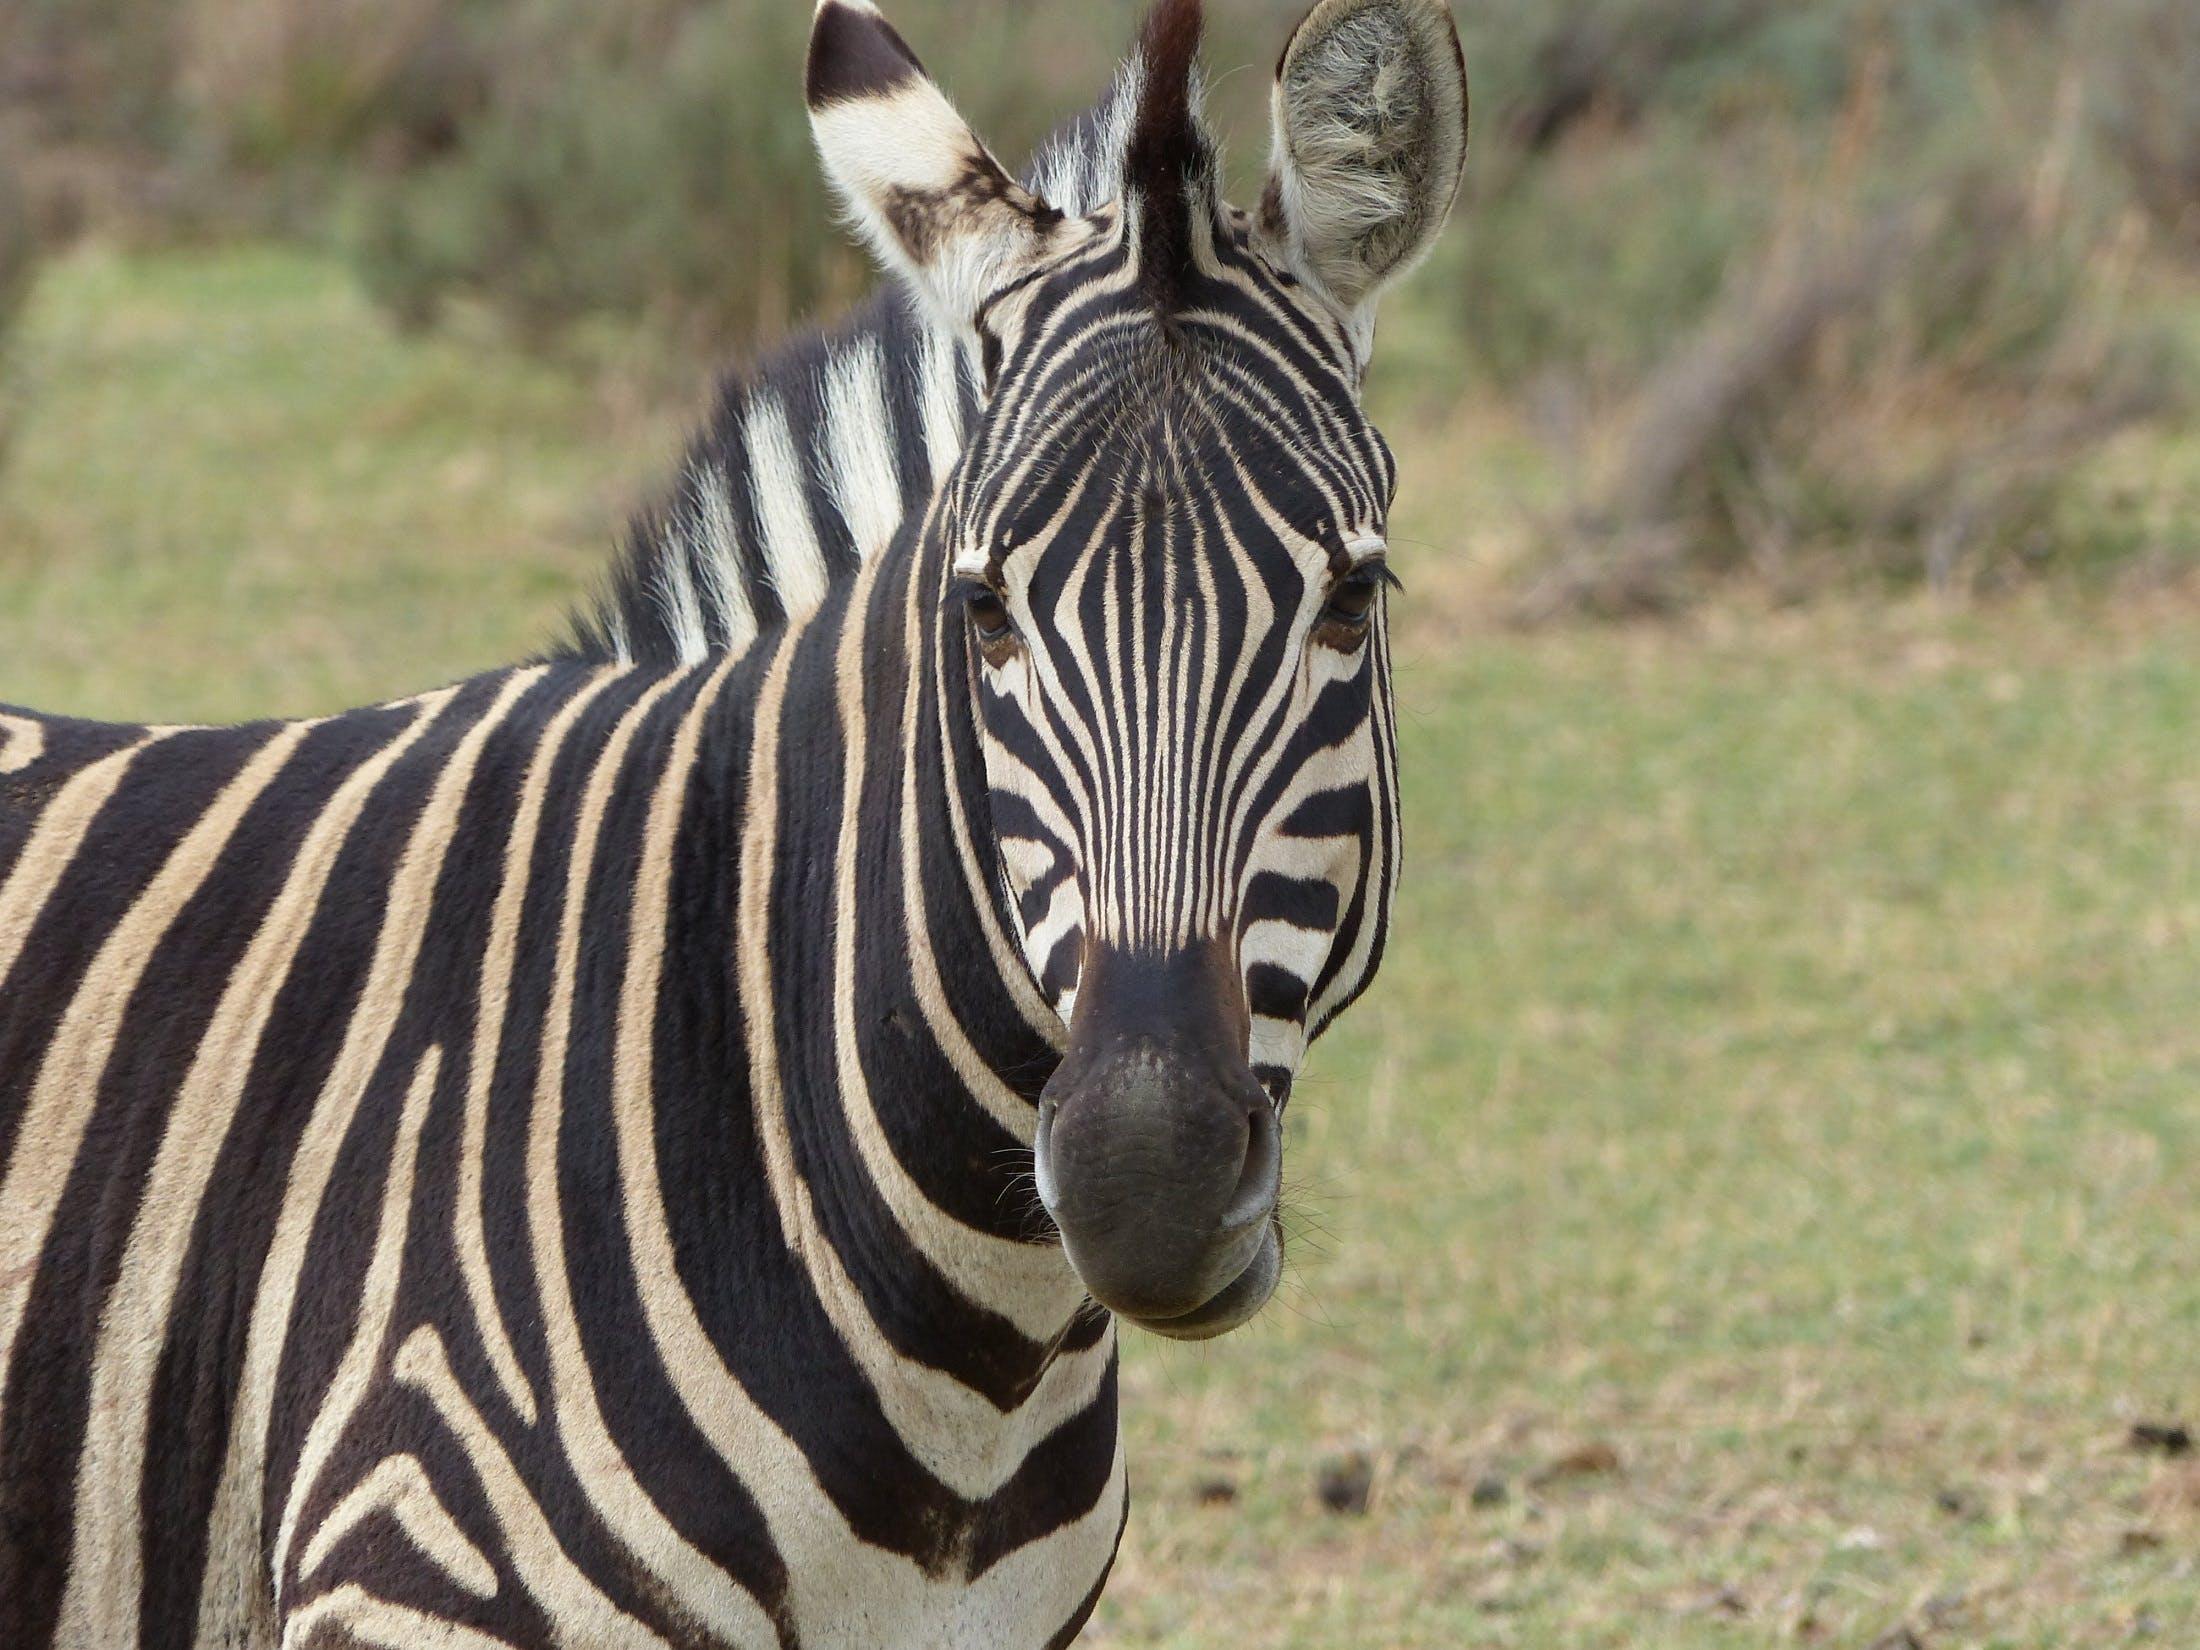 Close Up Photography of Zebra Animal during Daytime